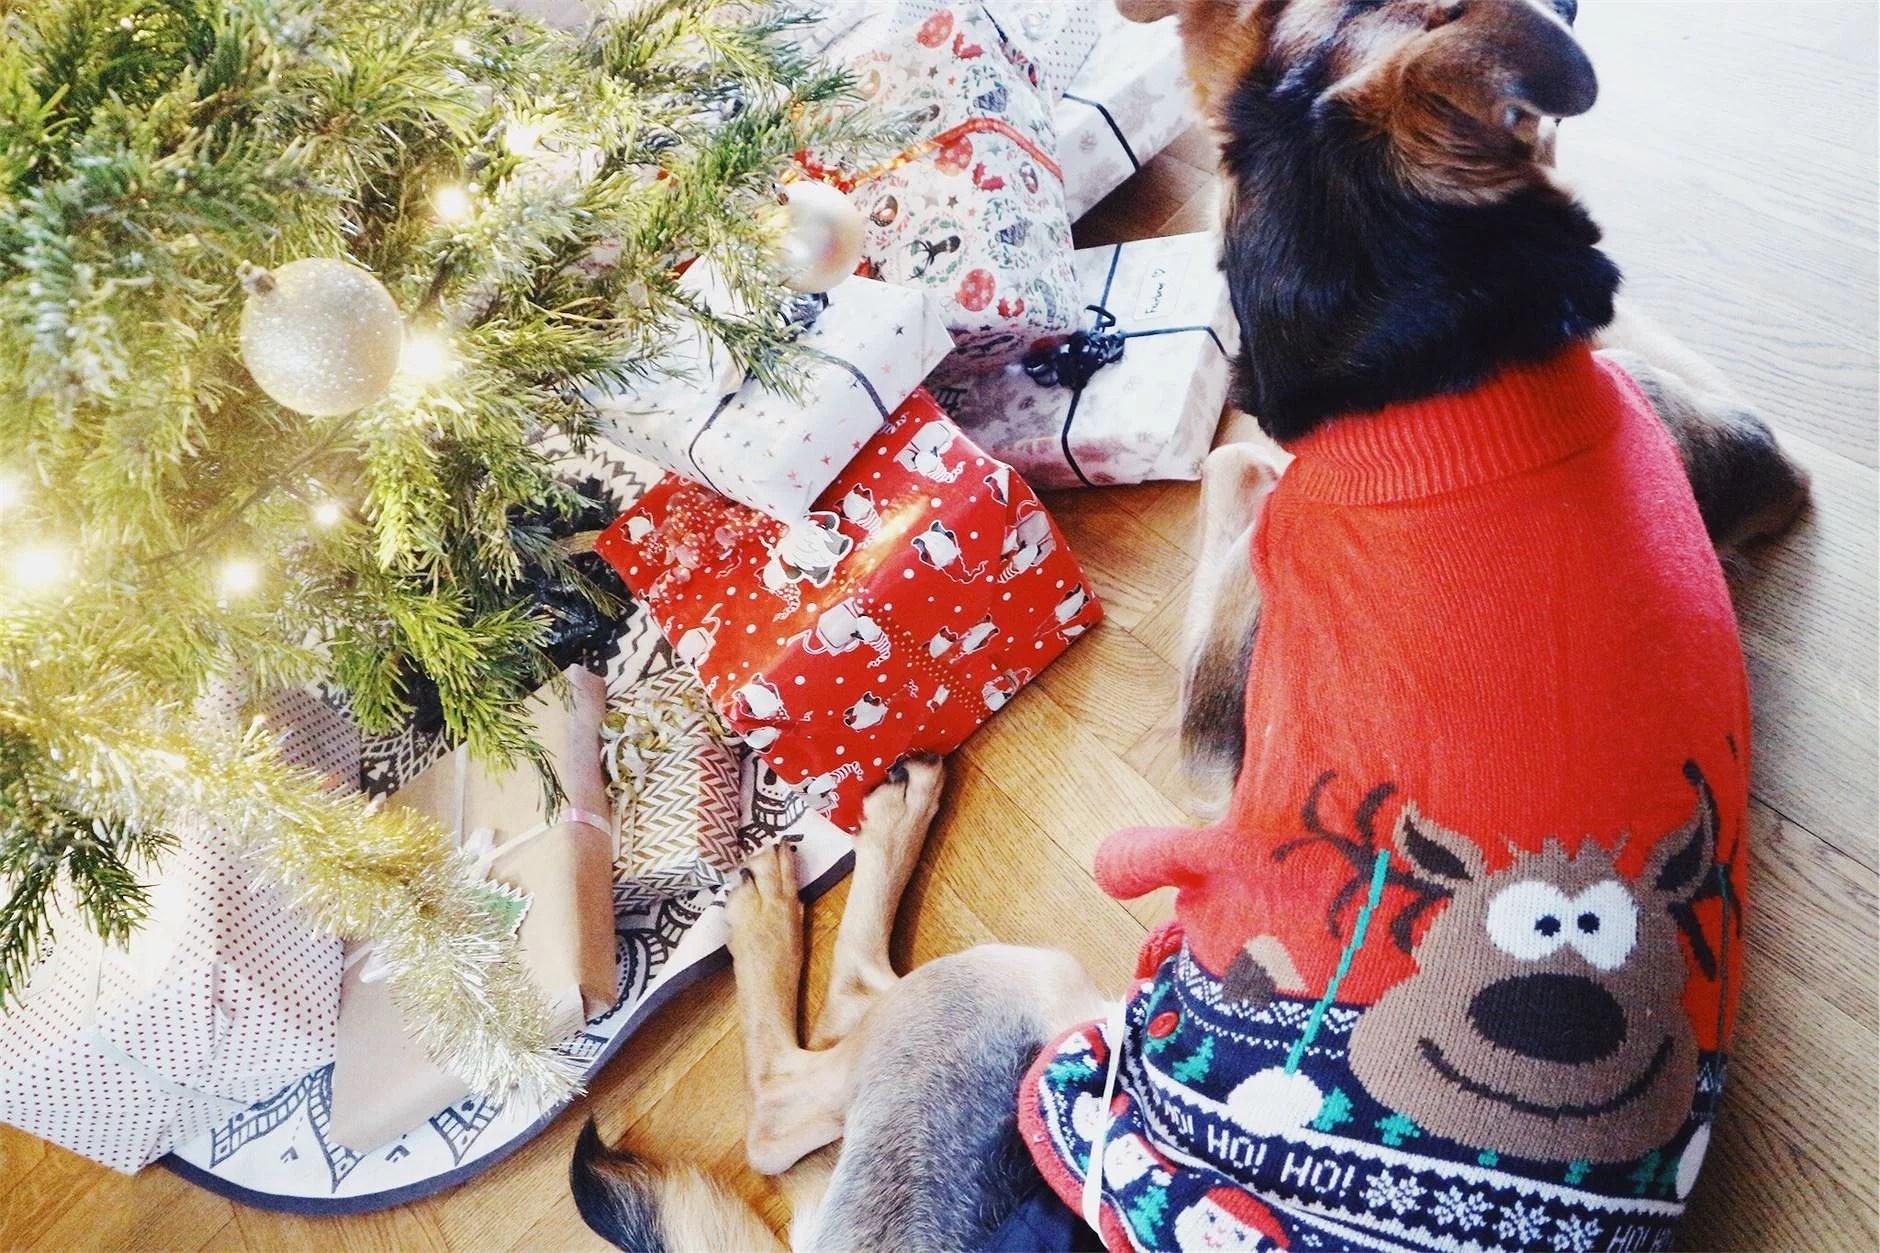 Min Julafton